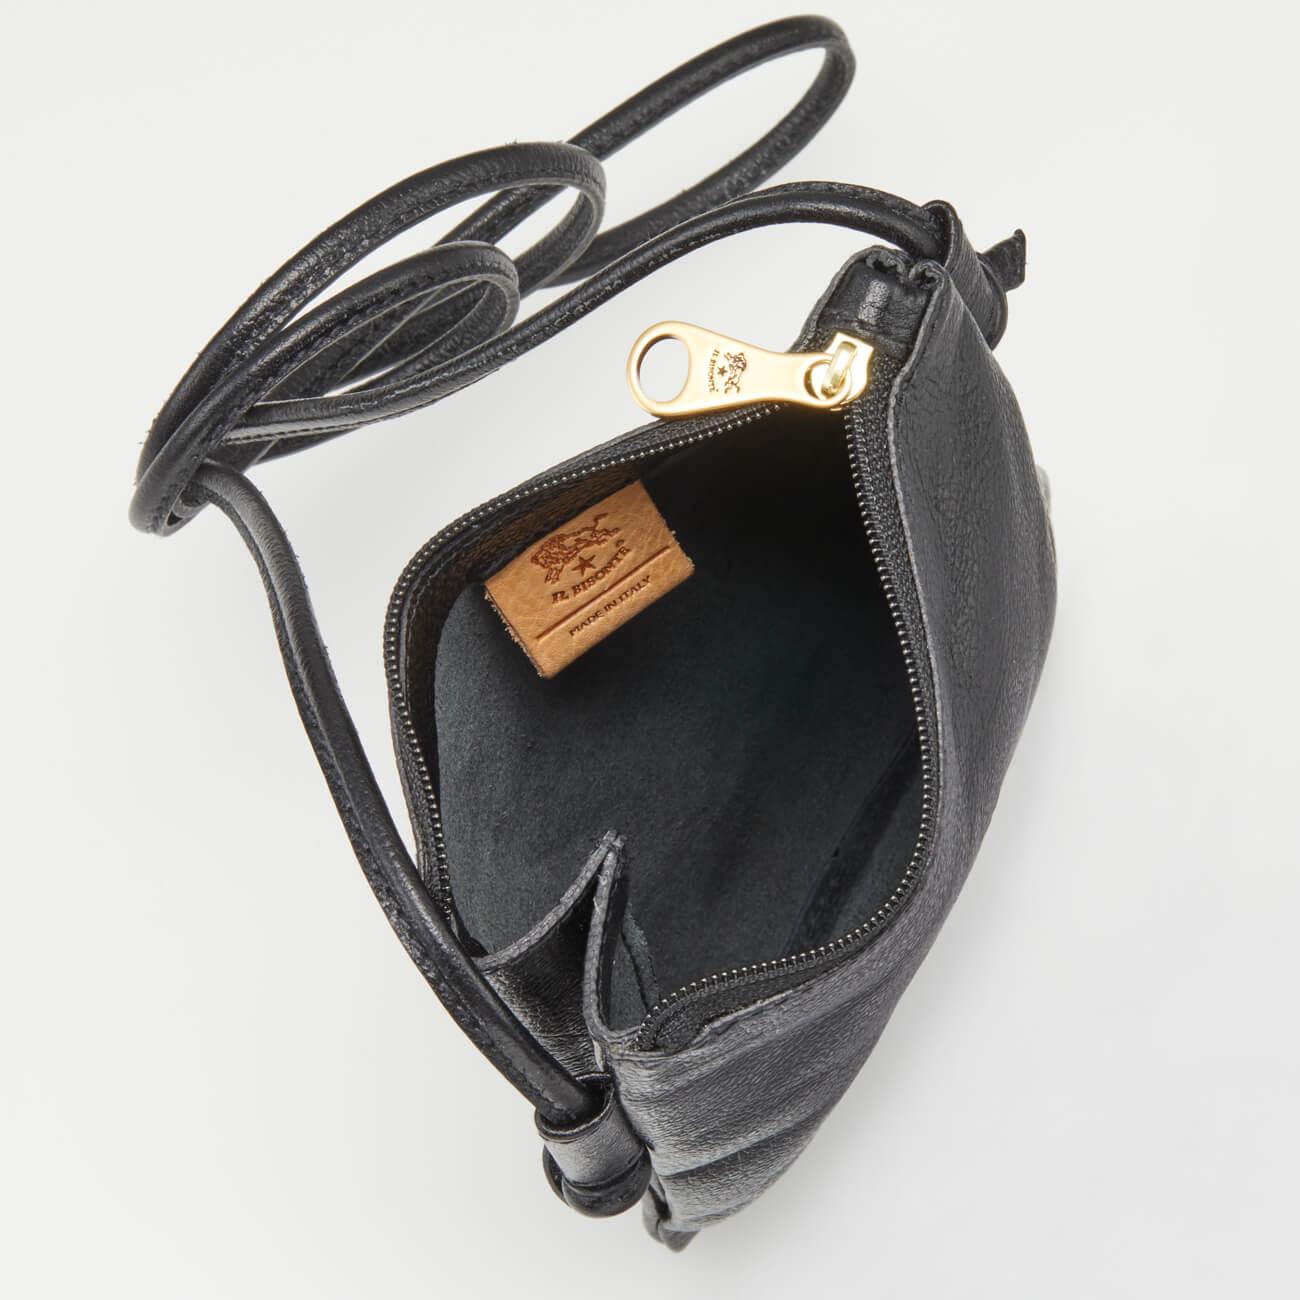 IL BISONTE (イル ビゾンテ) 日本公式オンラインストア ショルダーバッグ 54192305210